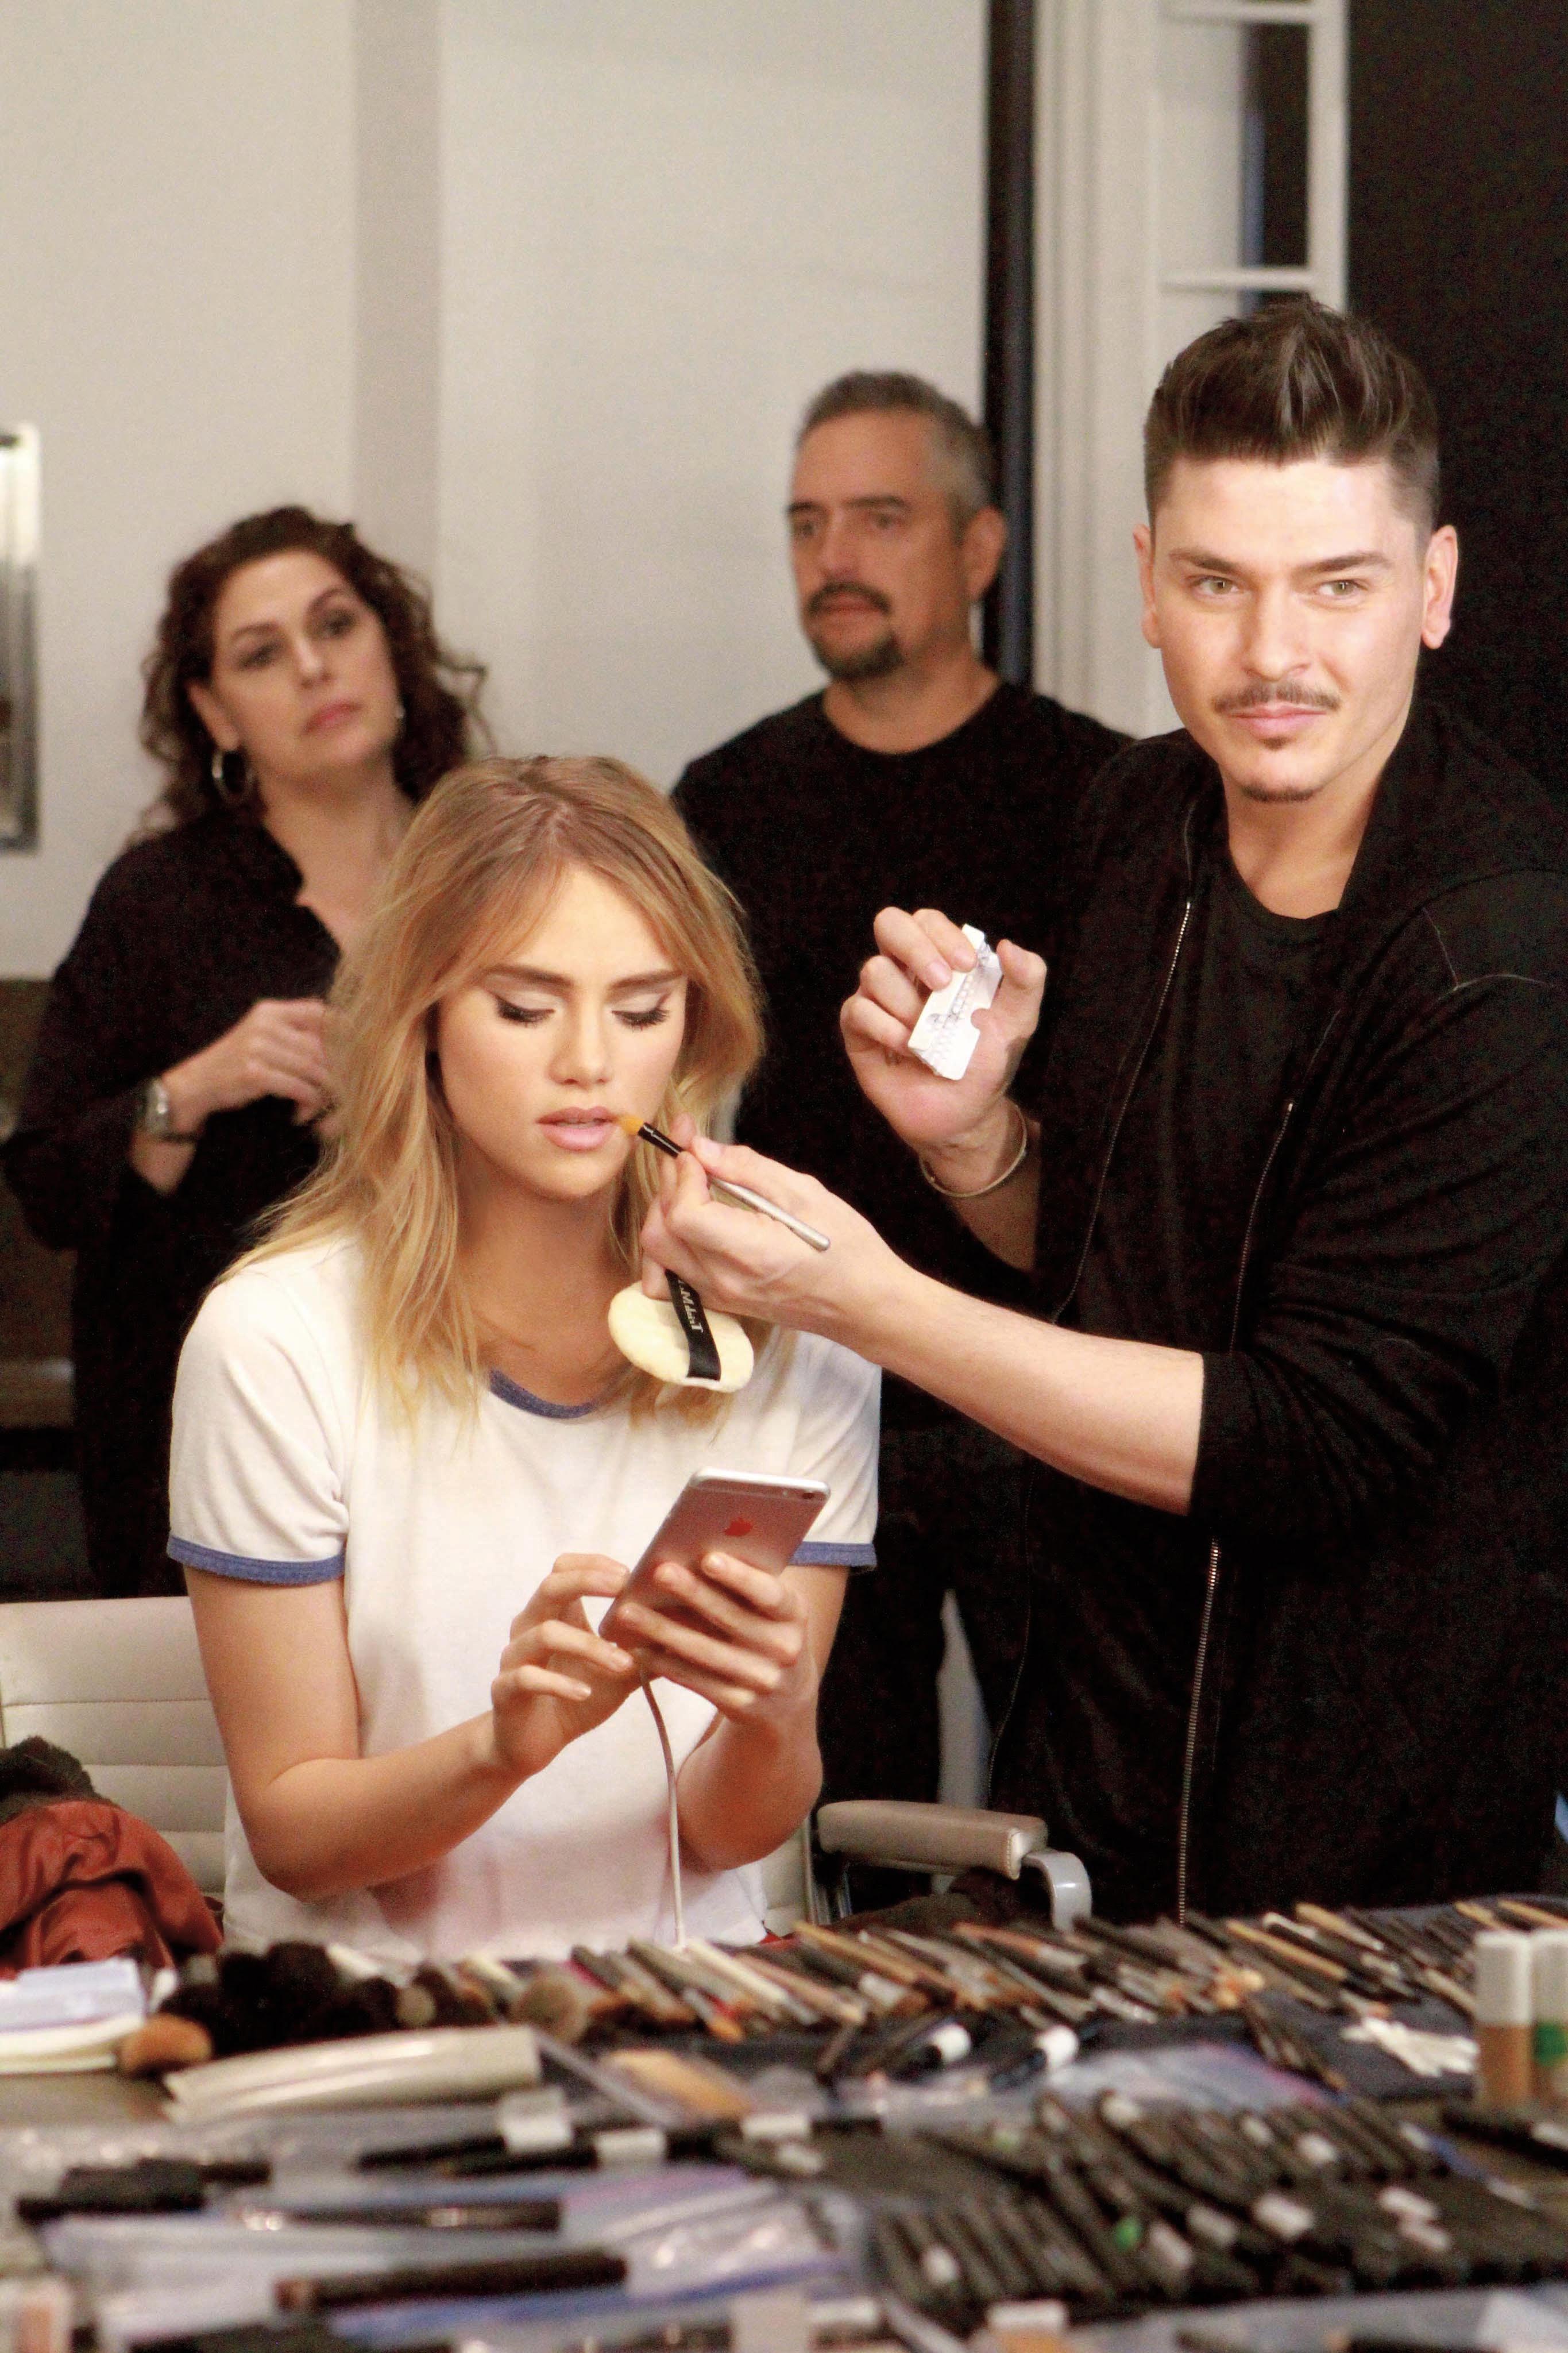 Behind the scenes with Mario Dedivanovic and Suki Waterhouse shooting Laura Mercier's fall 2017 campaign.